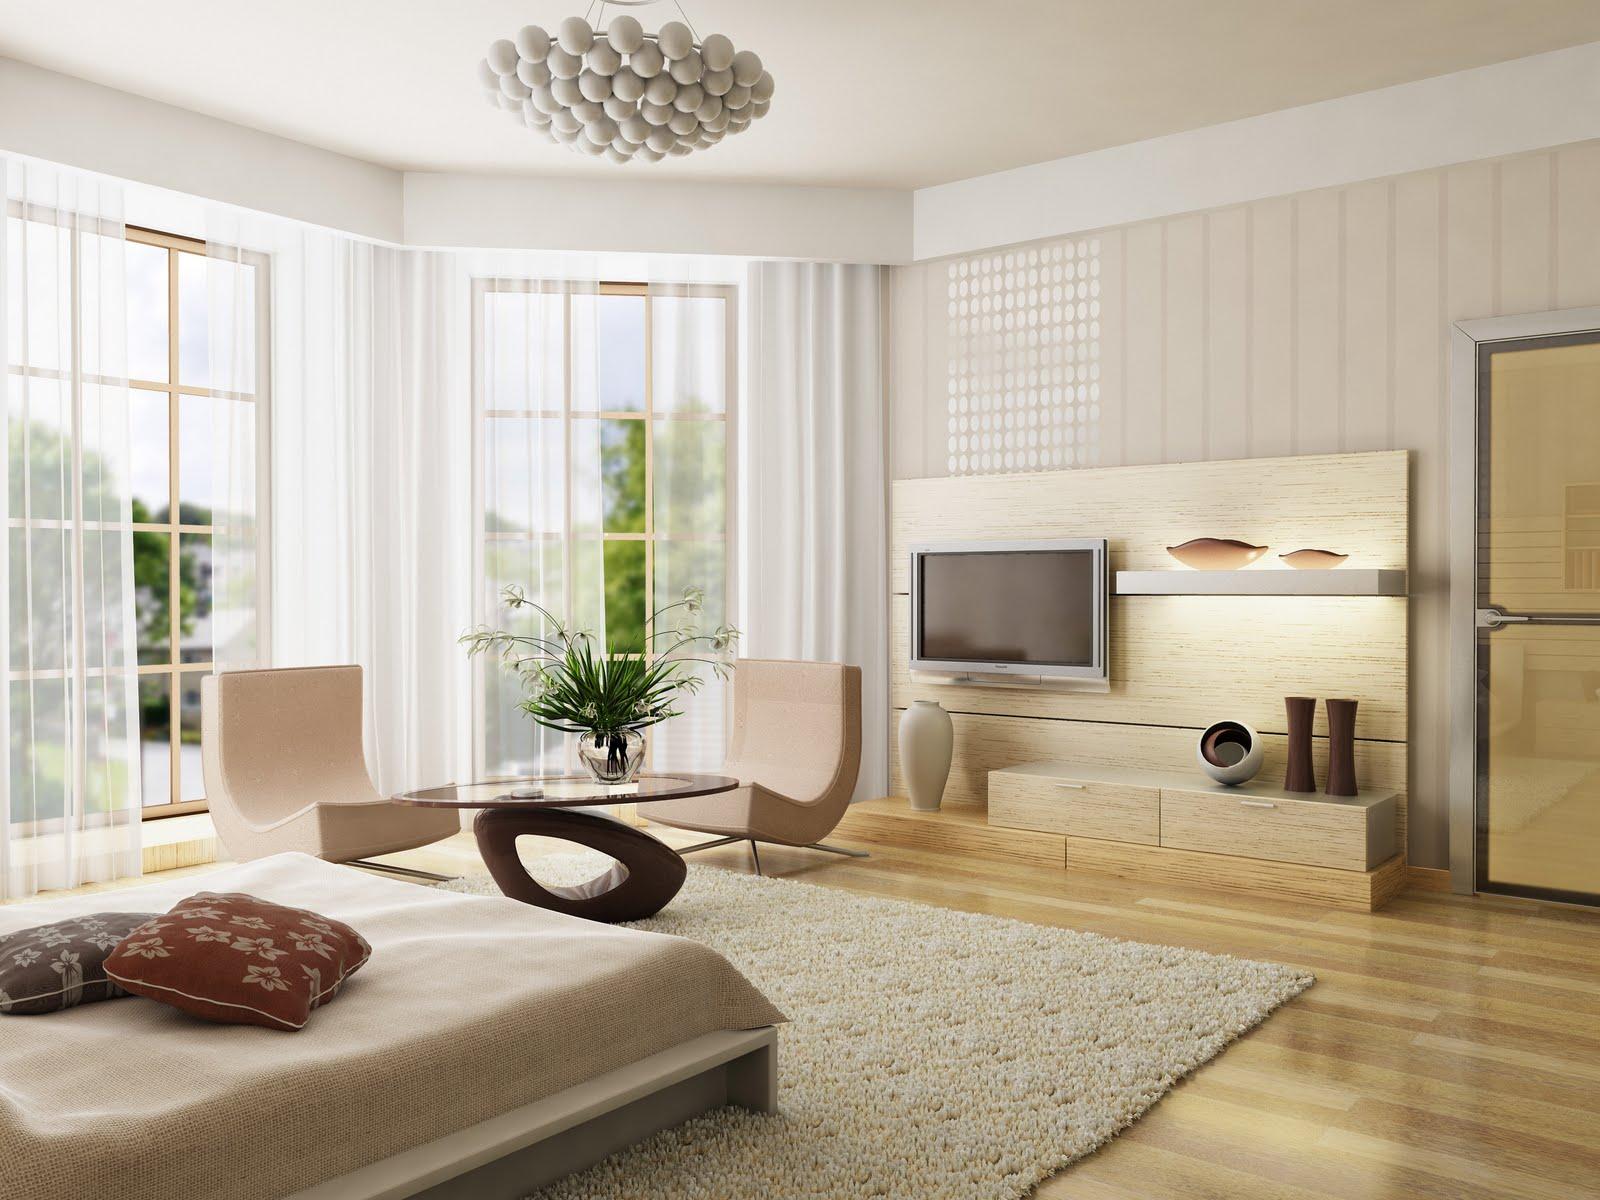 http://1.bp.blogspot.com/-QD42voH51ZI/Tjtd78XnB2I/AAAAAAAABts/VtDdKKHD2cQ/s1600/living-room-ides-511.jpg